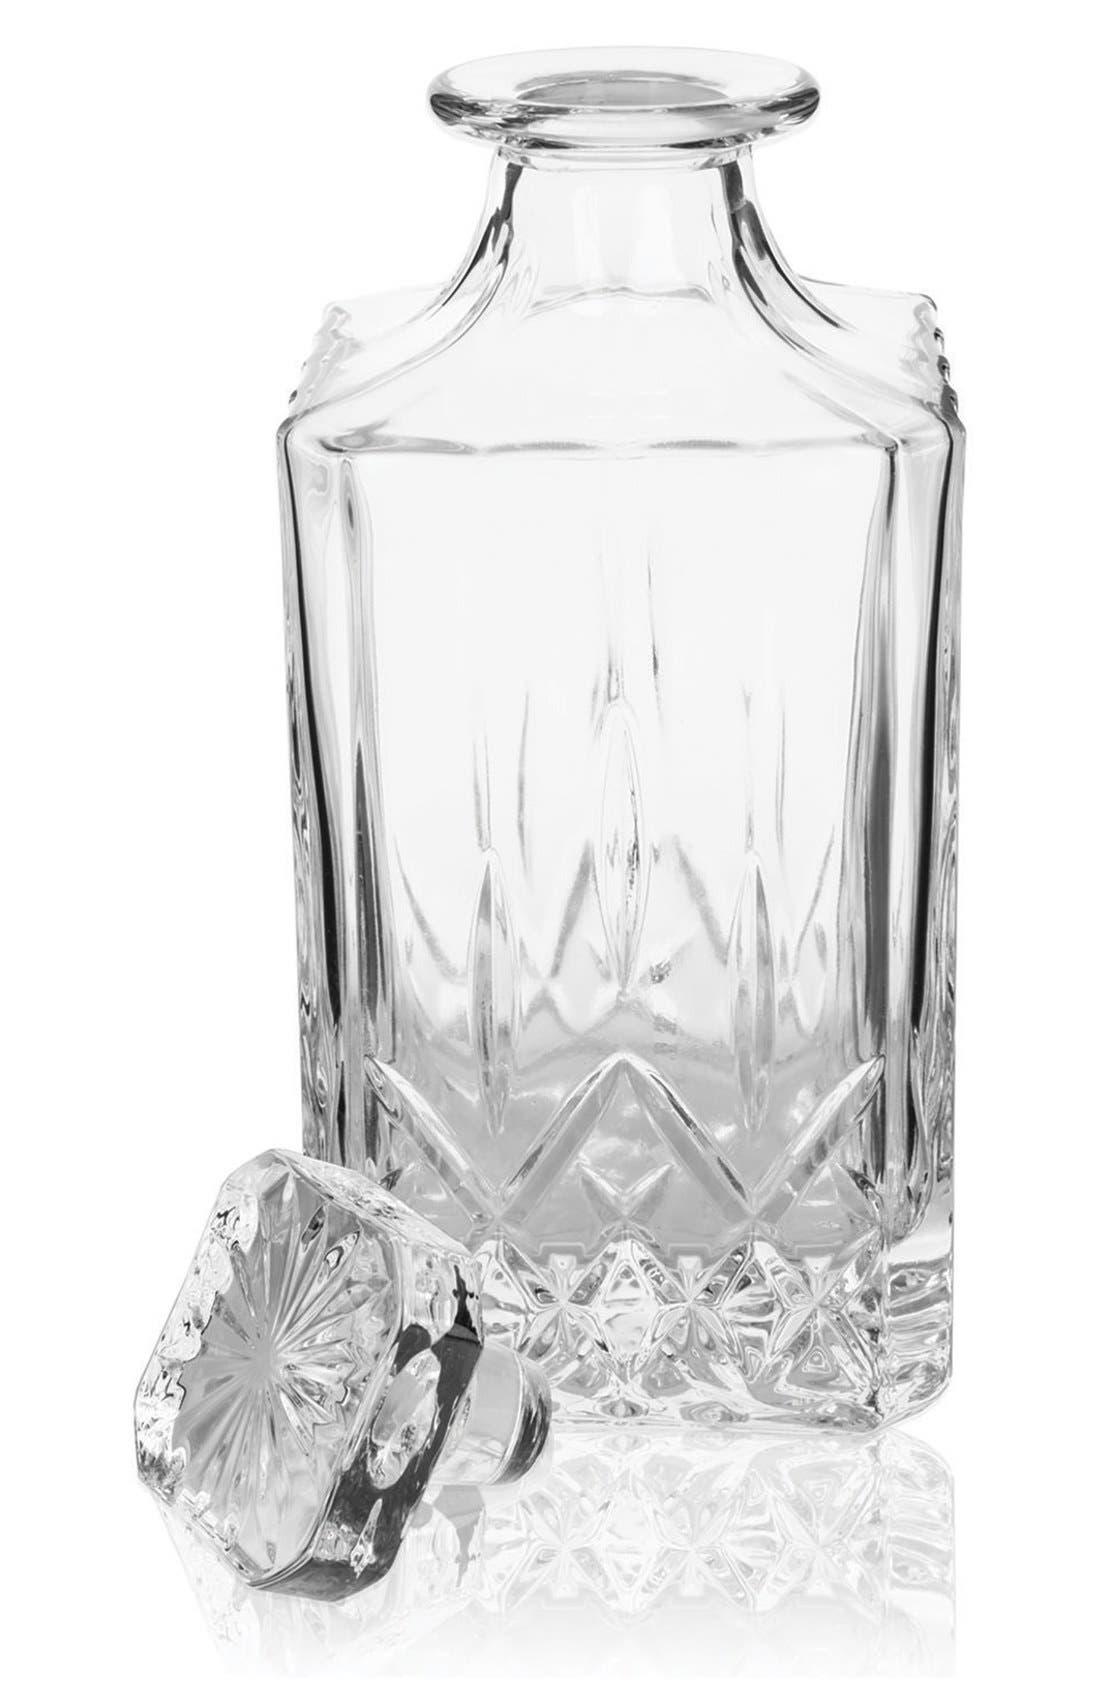 Alternate Image 1 Selected - Viski by True Fabrications Glass Wine Decanter